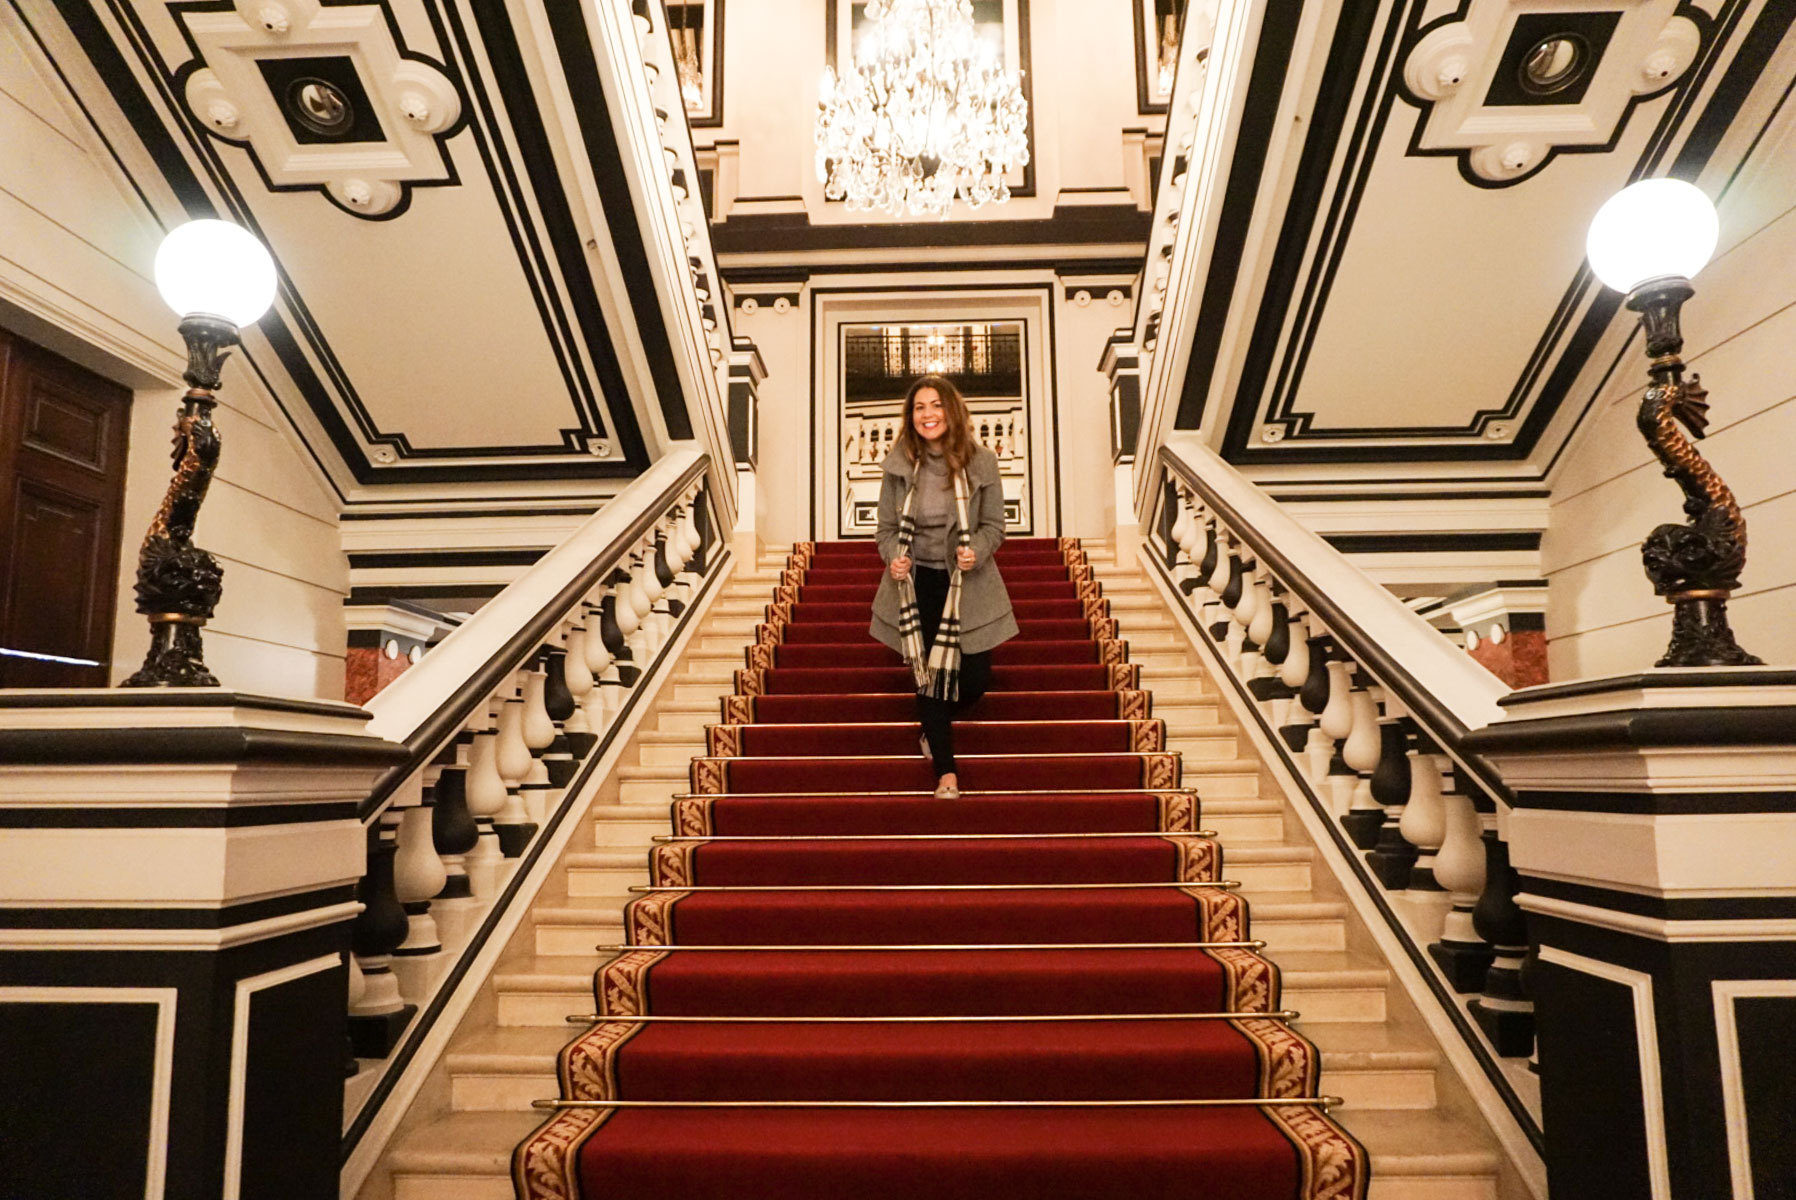 St.James Hotel_Paris_Dream_Trip_to_Paris-2927.jpg